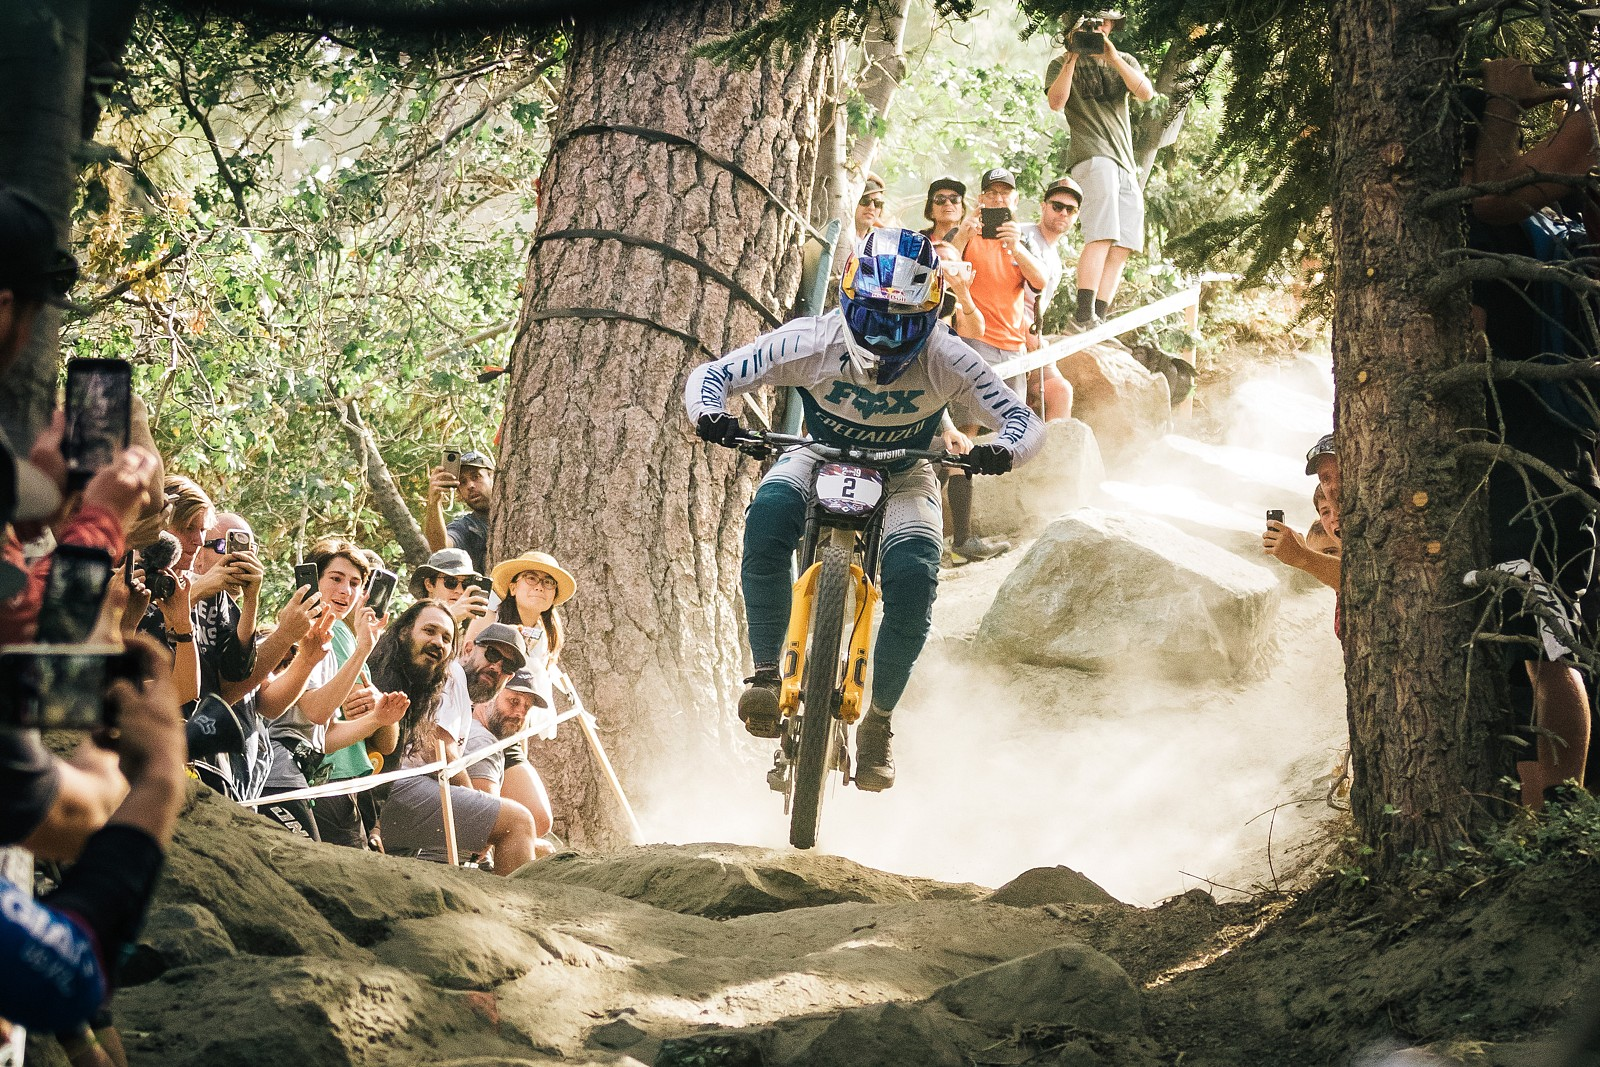 2019USOpenMTB DH yellow-32 - ALeedomPhotography - Mountain Biking Pictures - Vital MTB